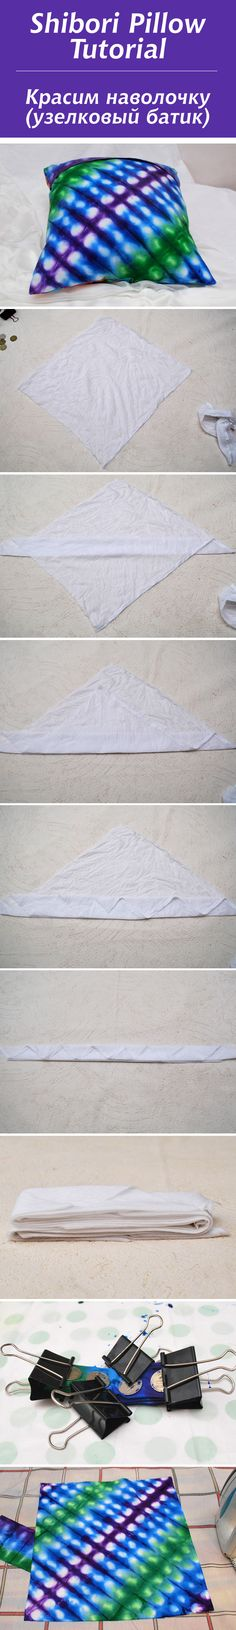 Роспись декоративной наволочки в технике узелкового батика: Узор в горошек / Shibori Pillow Tutorial #shibori